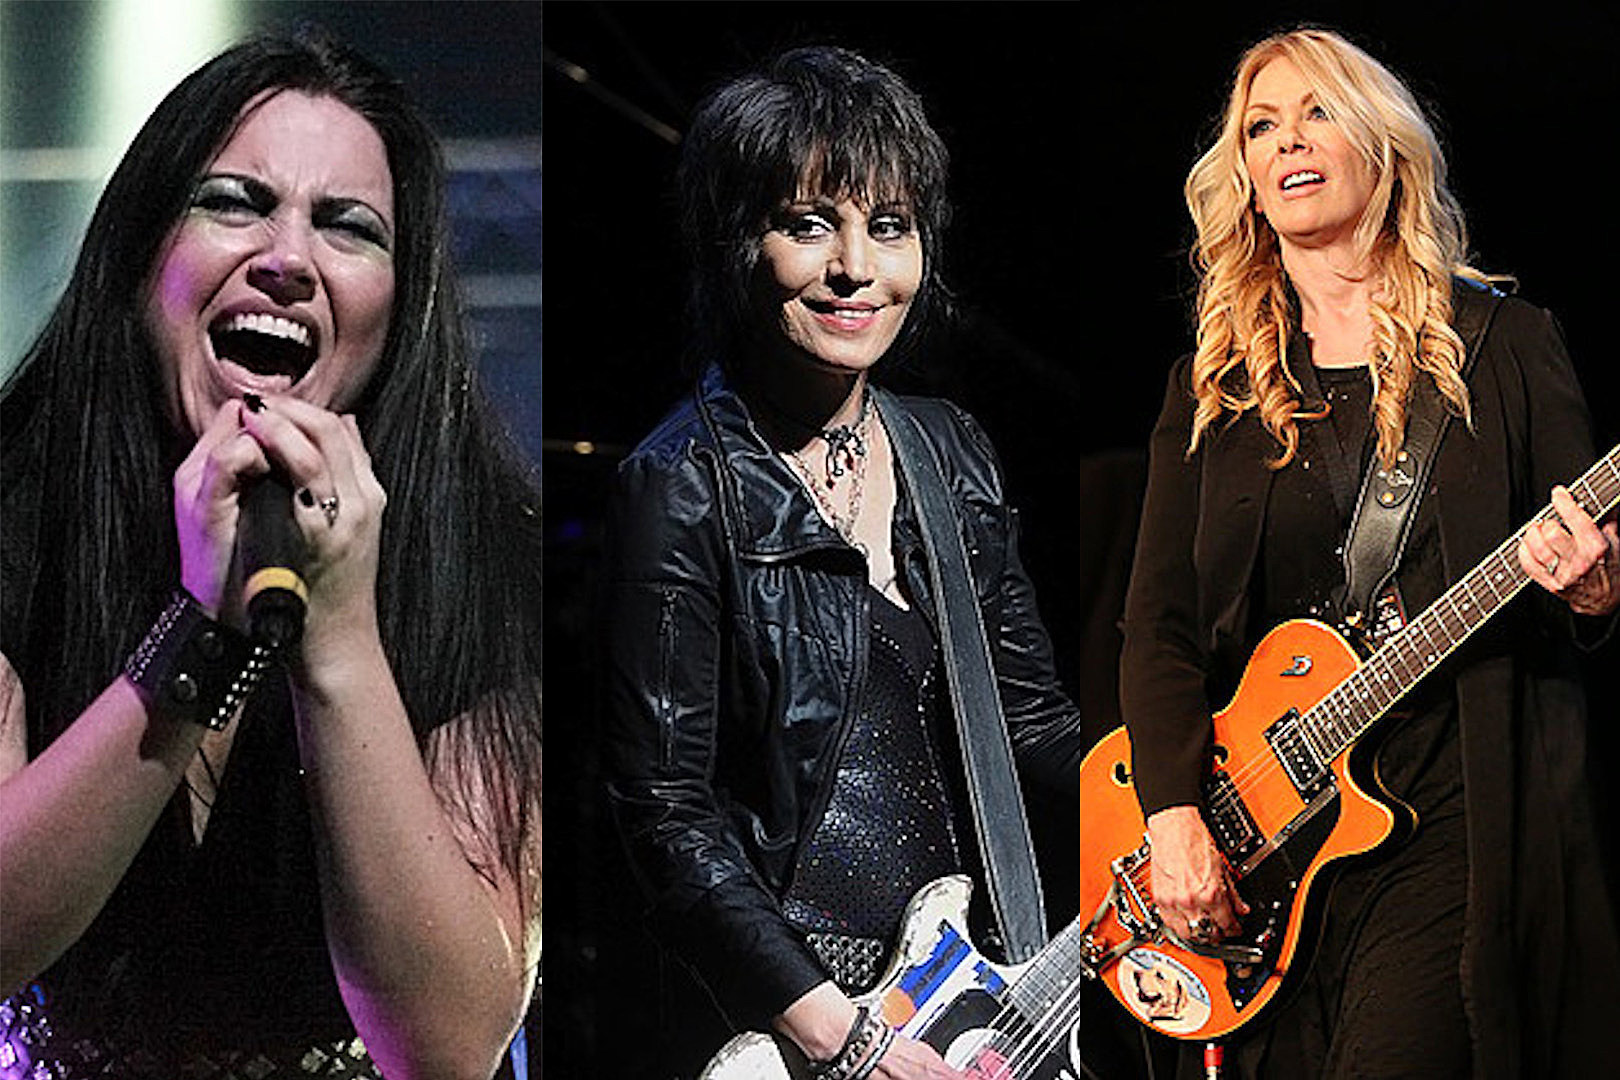 Evanescence Announce 2019 Headline Tour